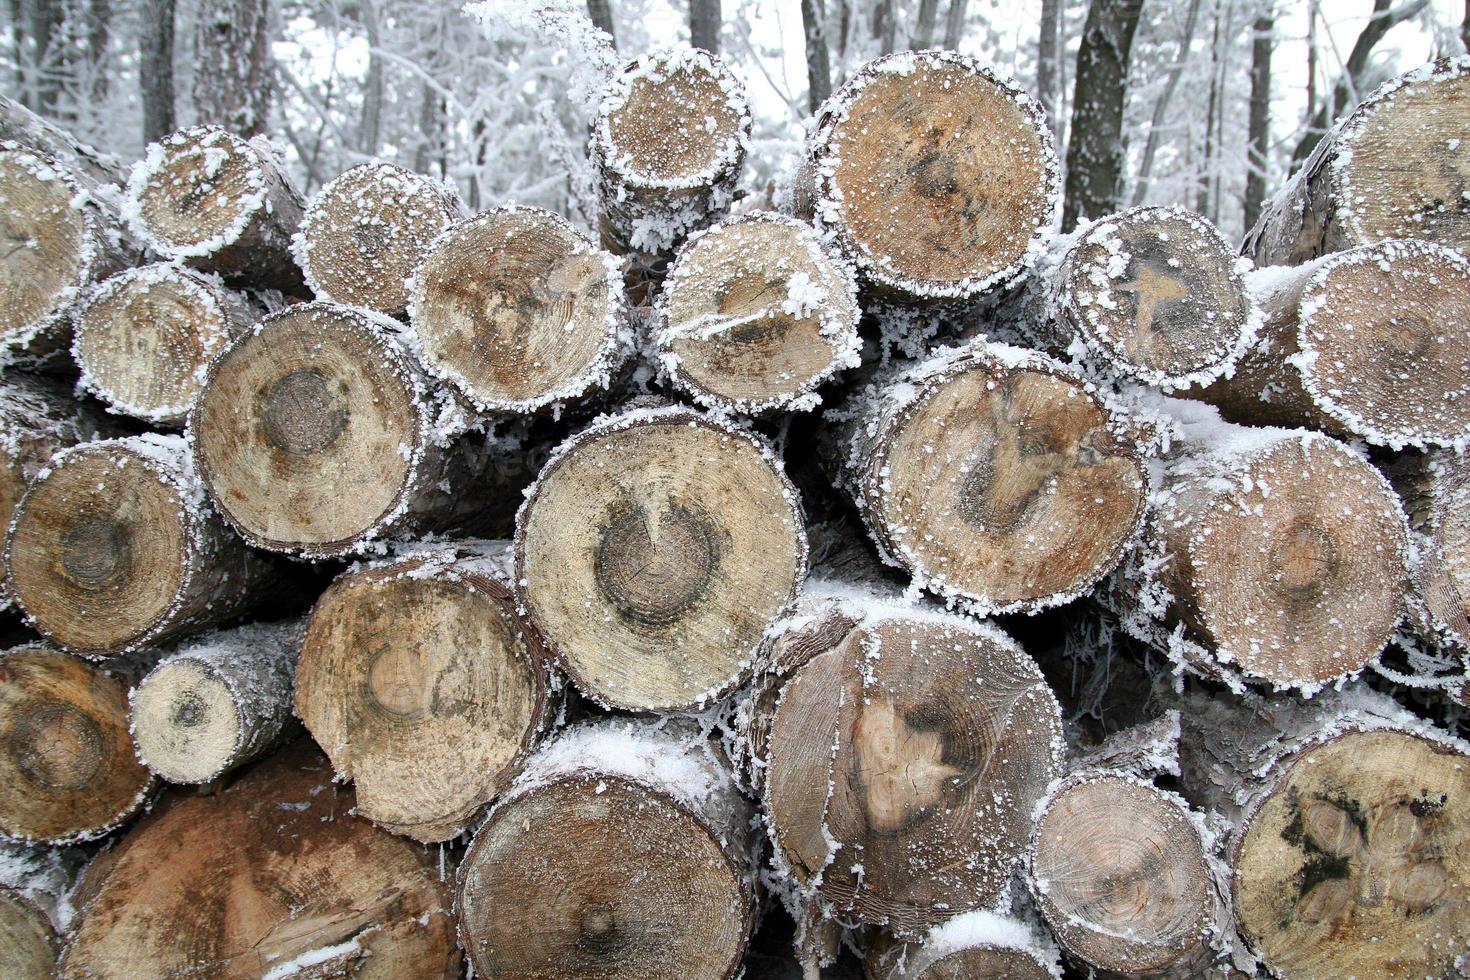 Tree stump in winter time. photo